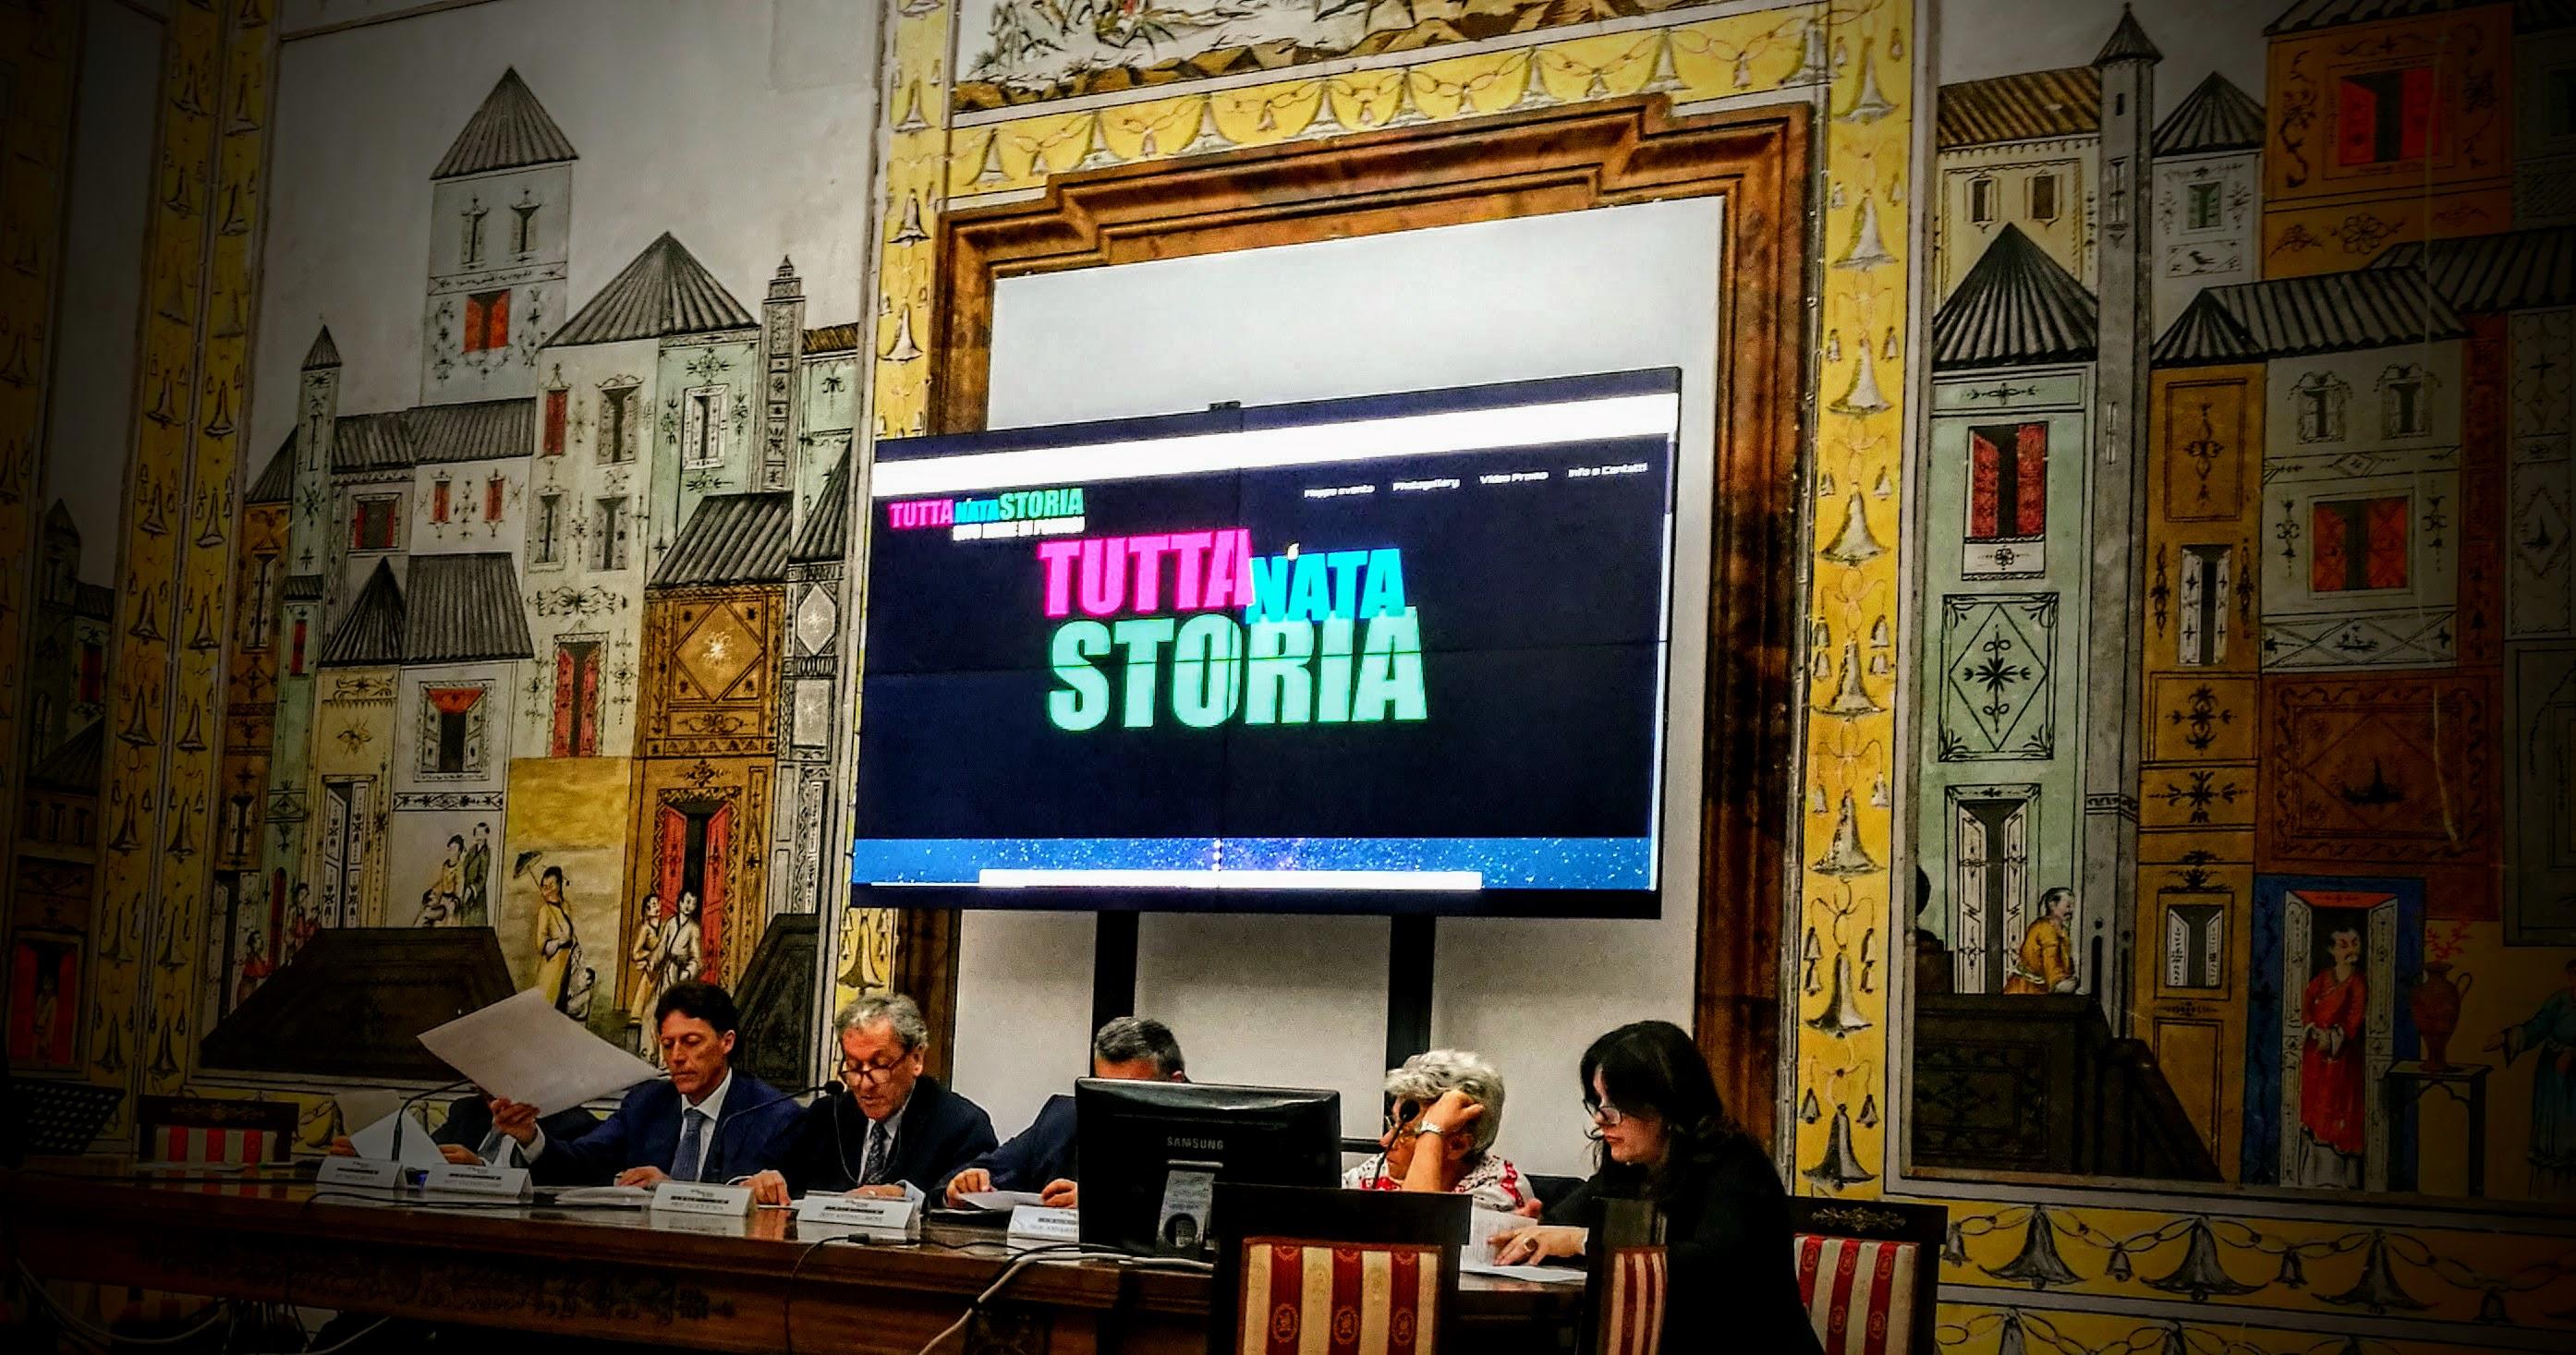 """Tutta n'ata Storia"": l'esperienza di campoAperto arriva a Portici"